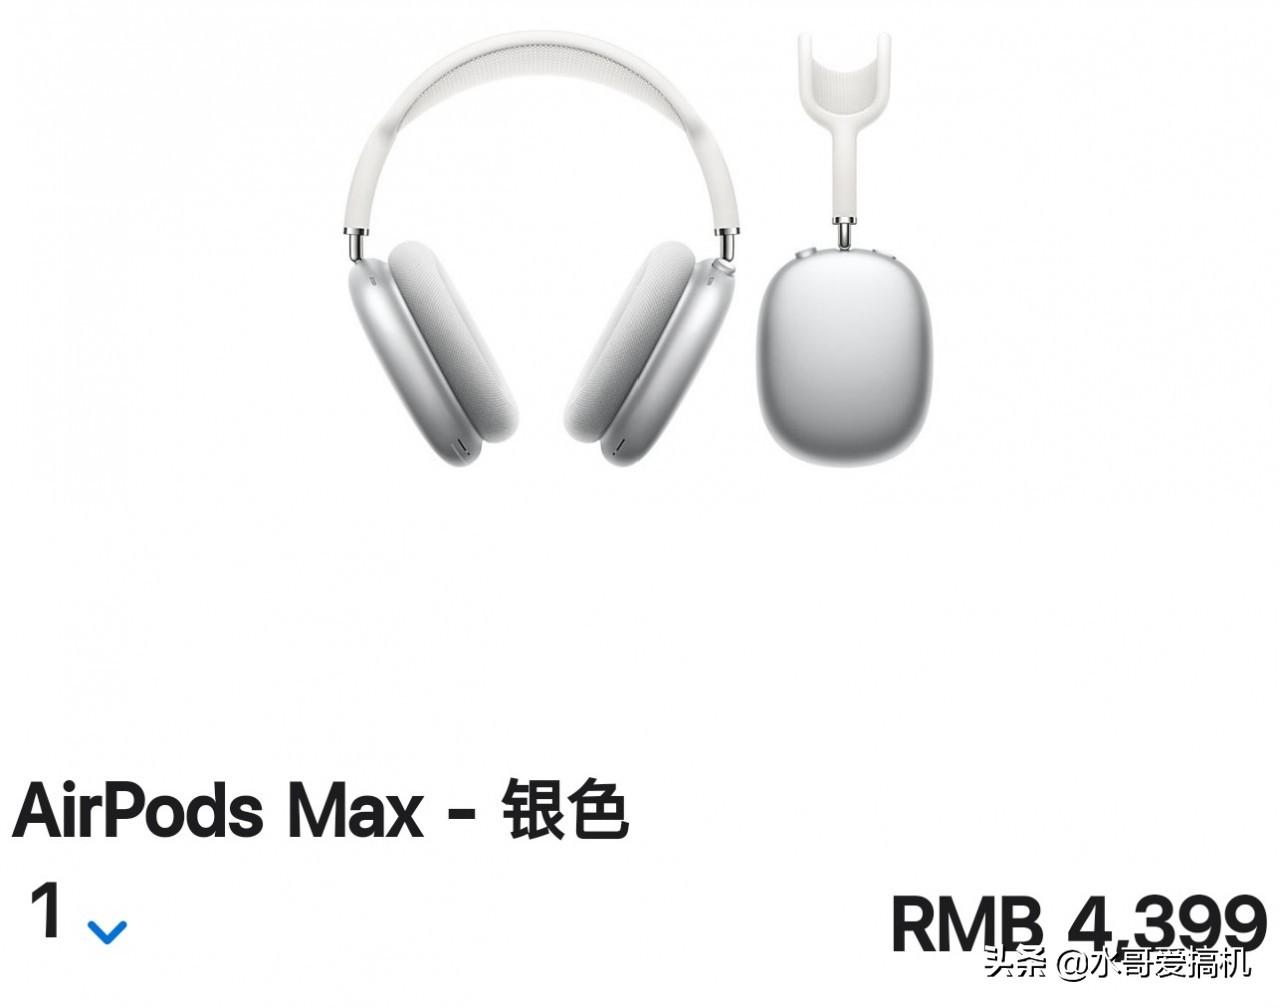 AirPodsMax卖四千多太贵,换成小米logo呢?